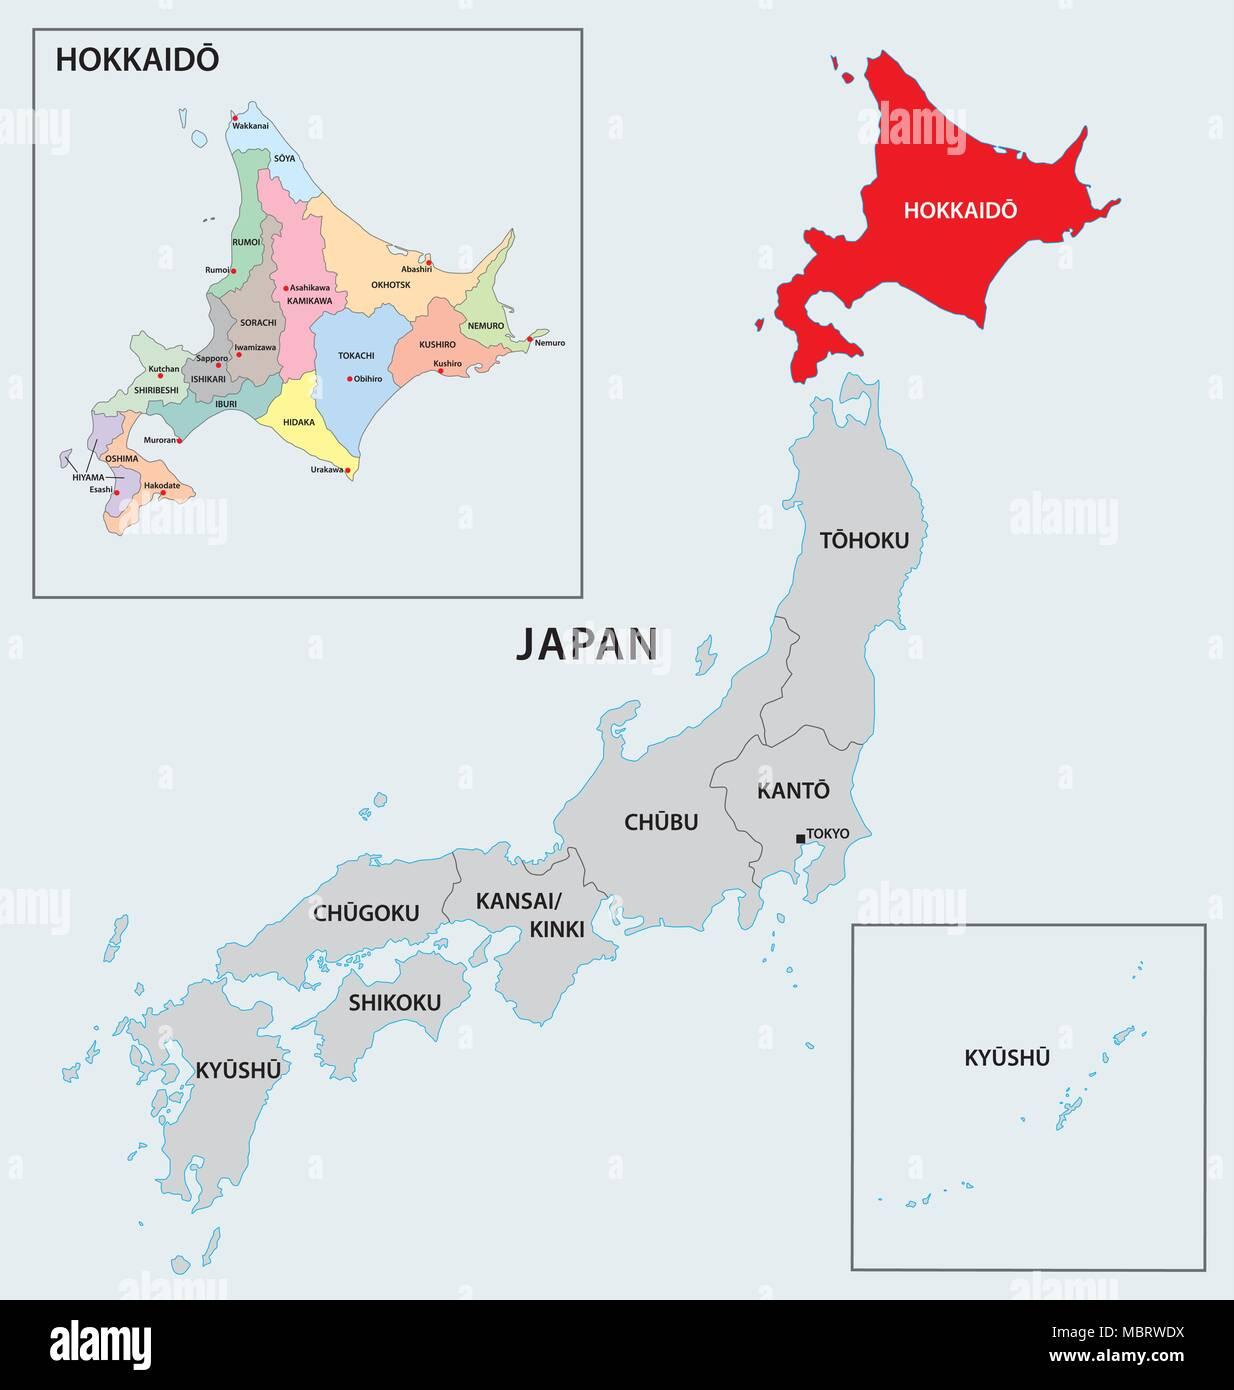 japan region hokkaido map - Stock Vector